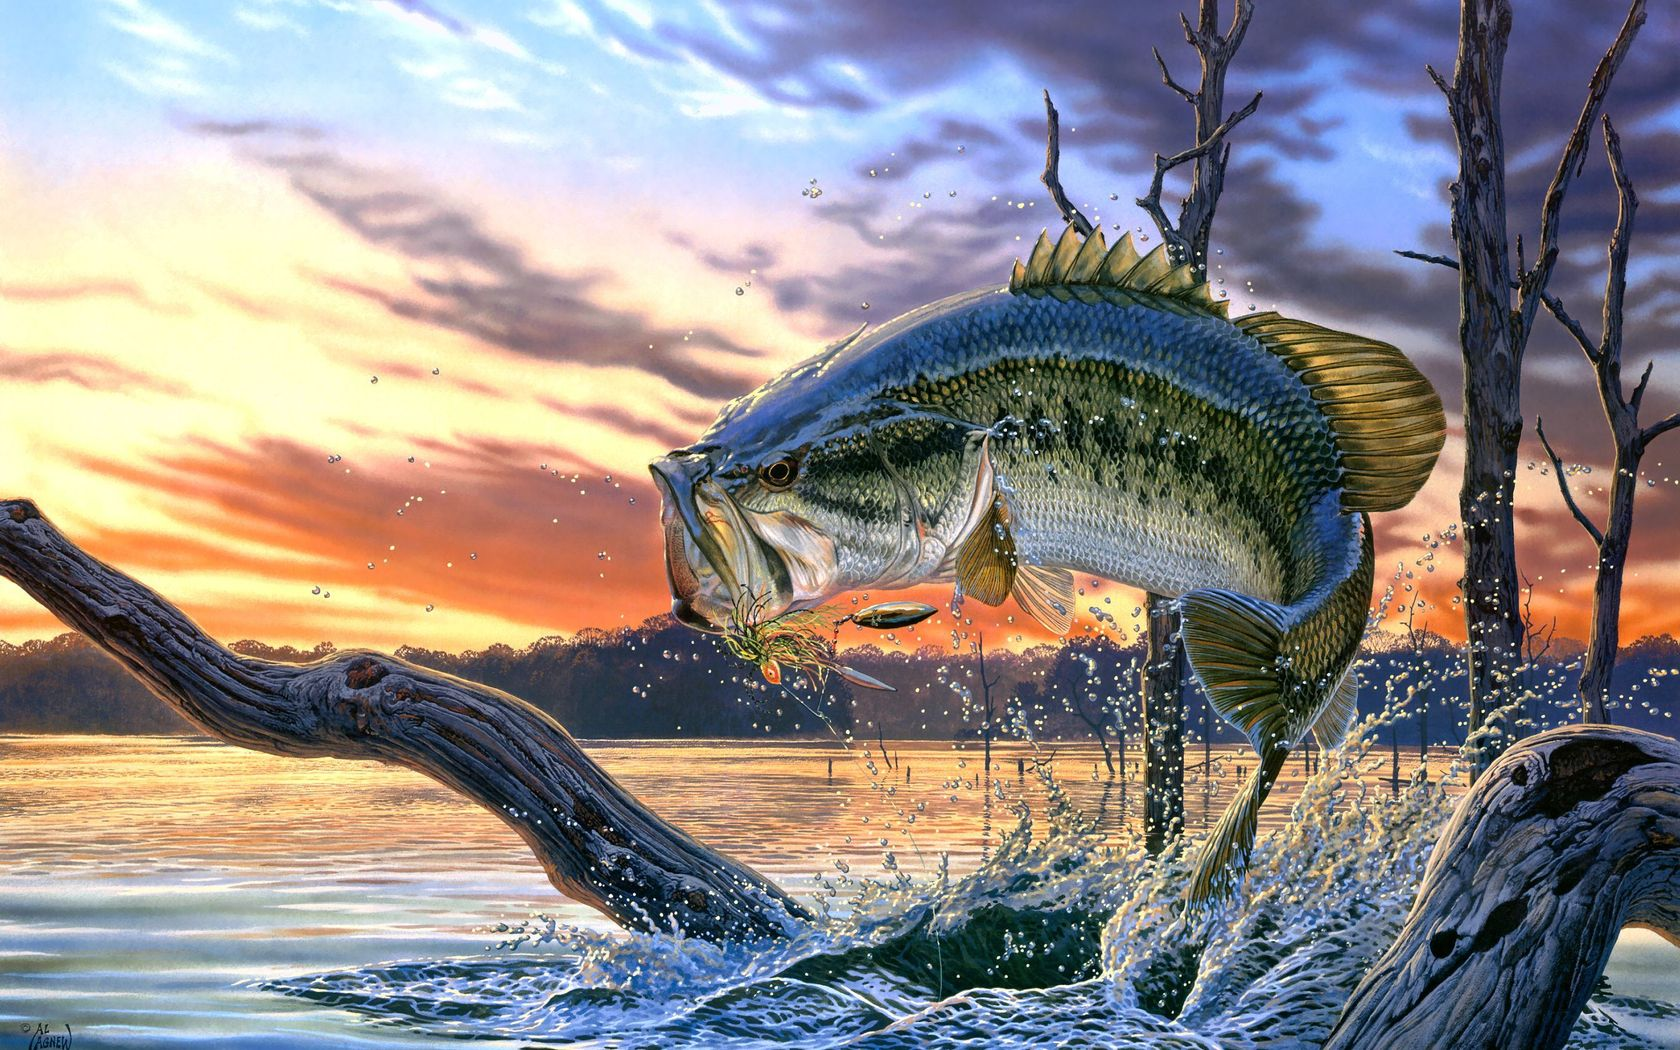 orglargemouth bass fishing wallpaper background screensaver 1680x1050